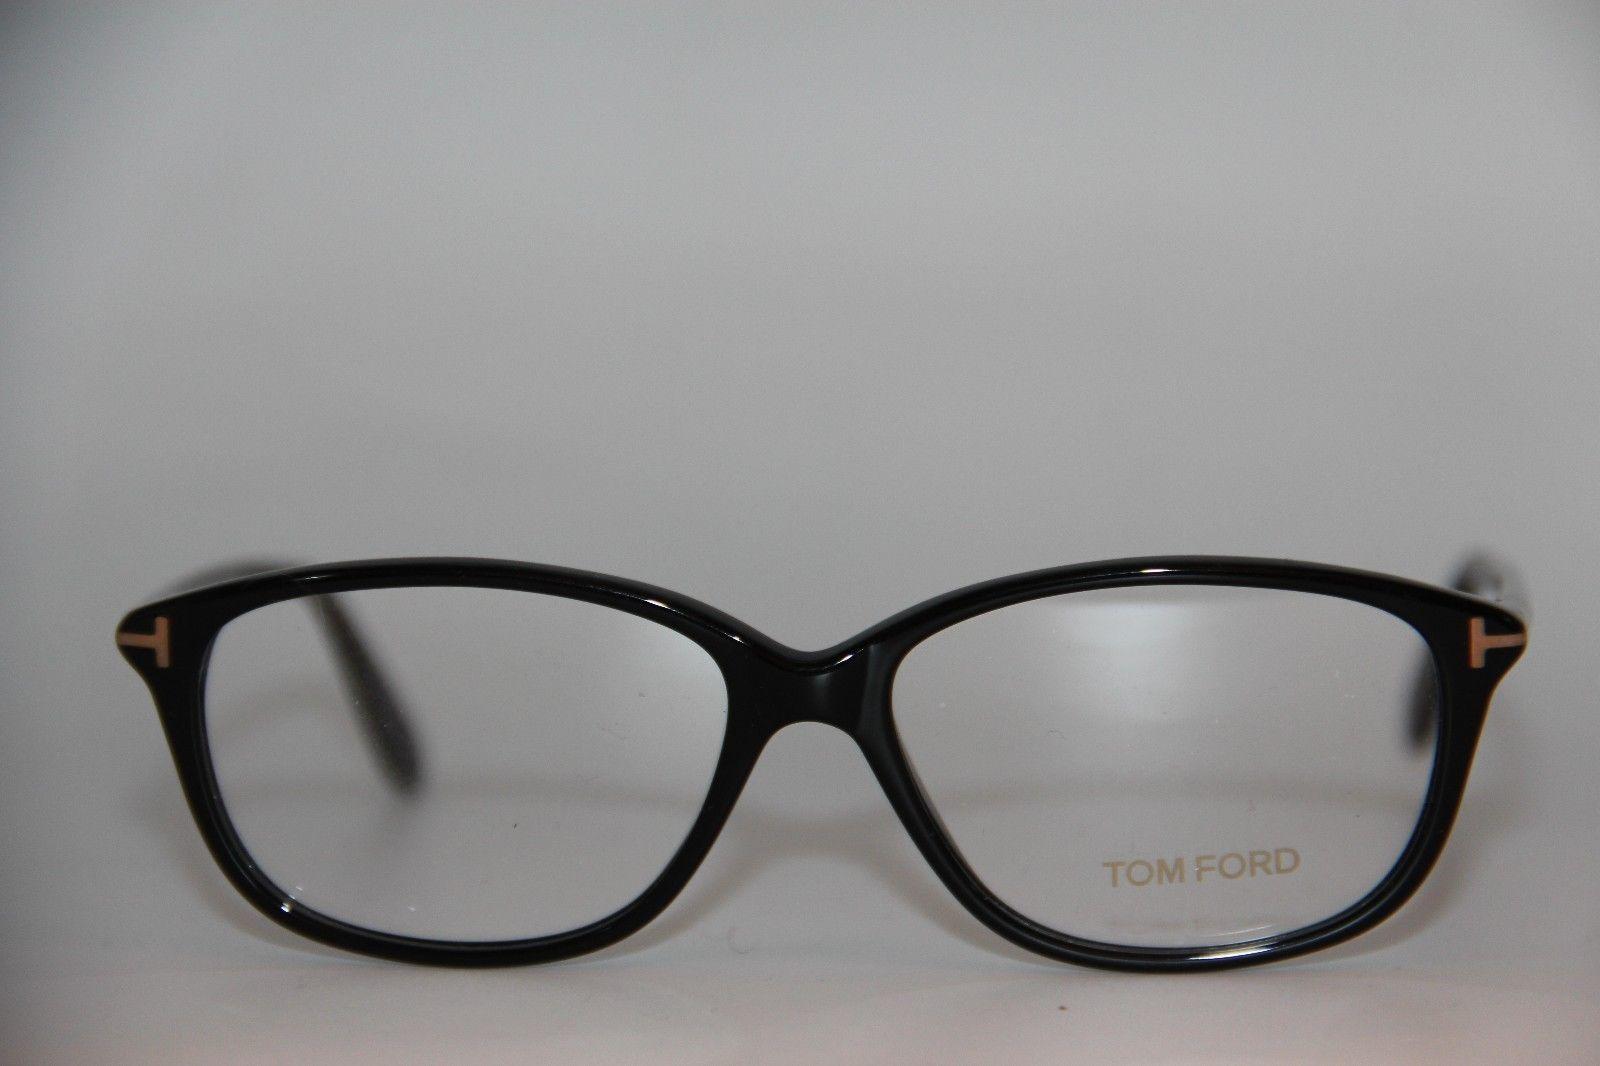 947c200511f NEW TOM FORD TF 5316 001 BLACK EYEGLASSES AUTHENTIC RX TF5316 54-14 W